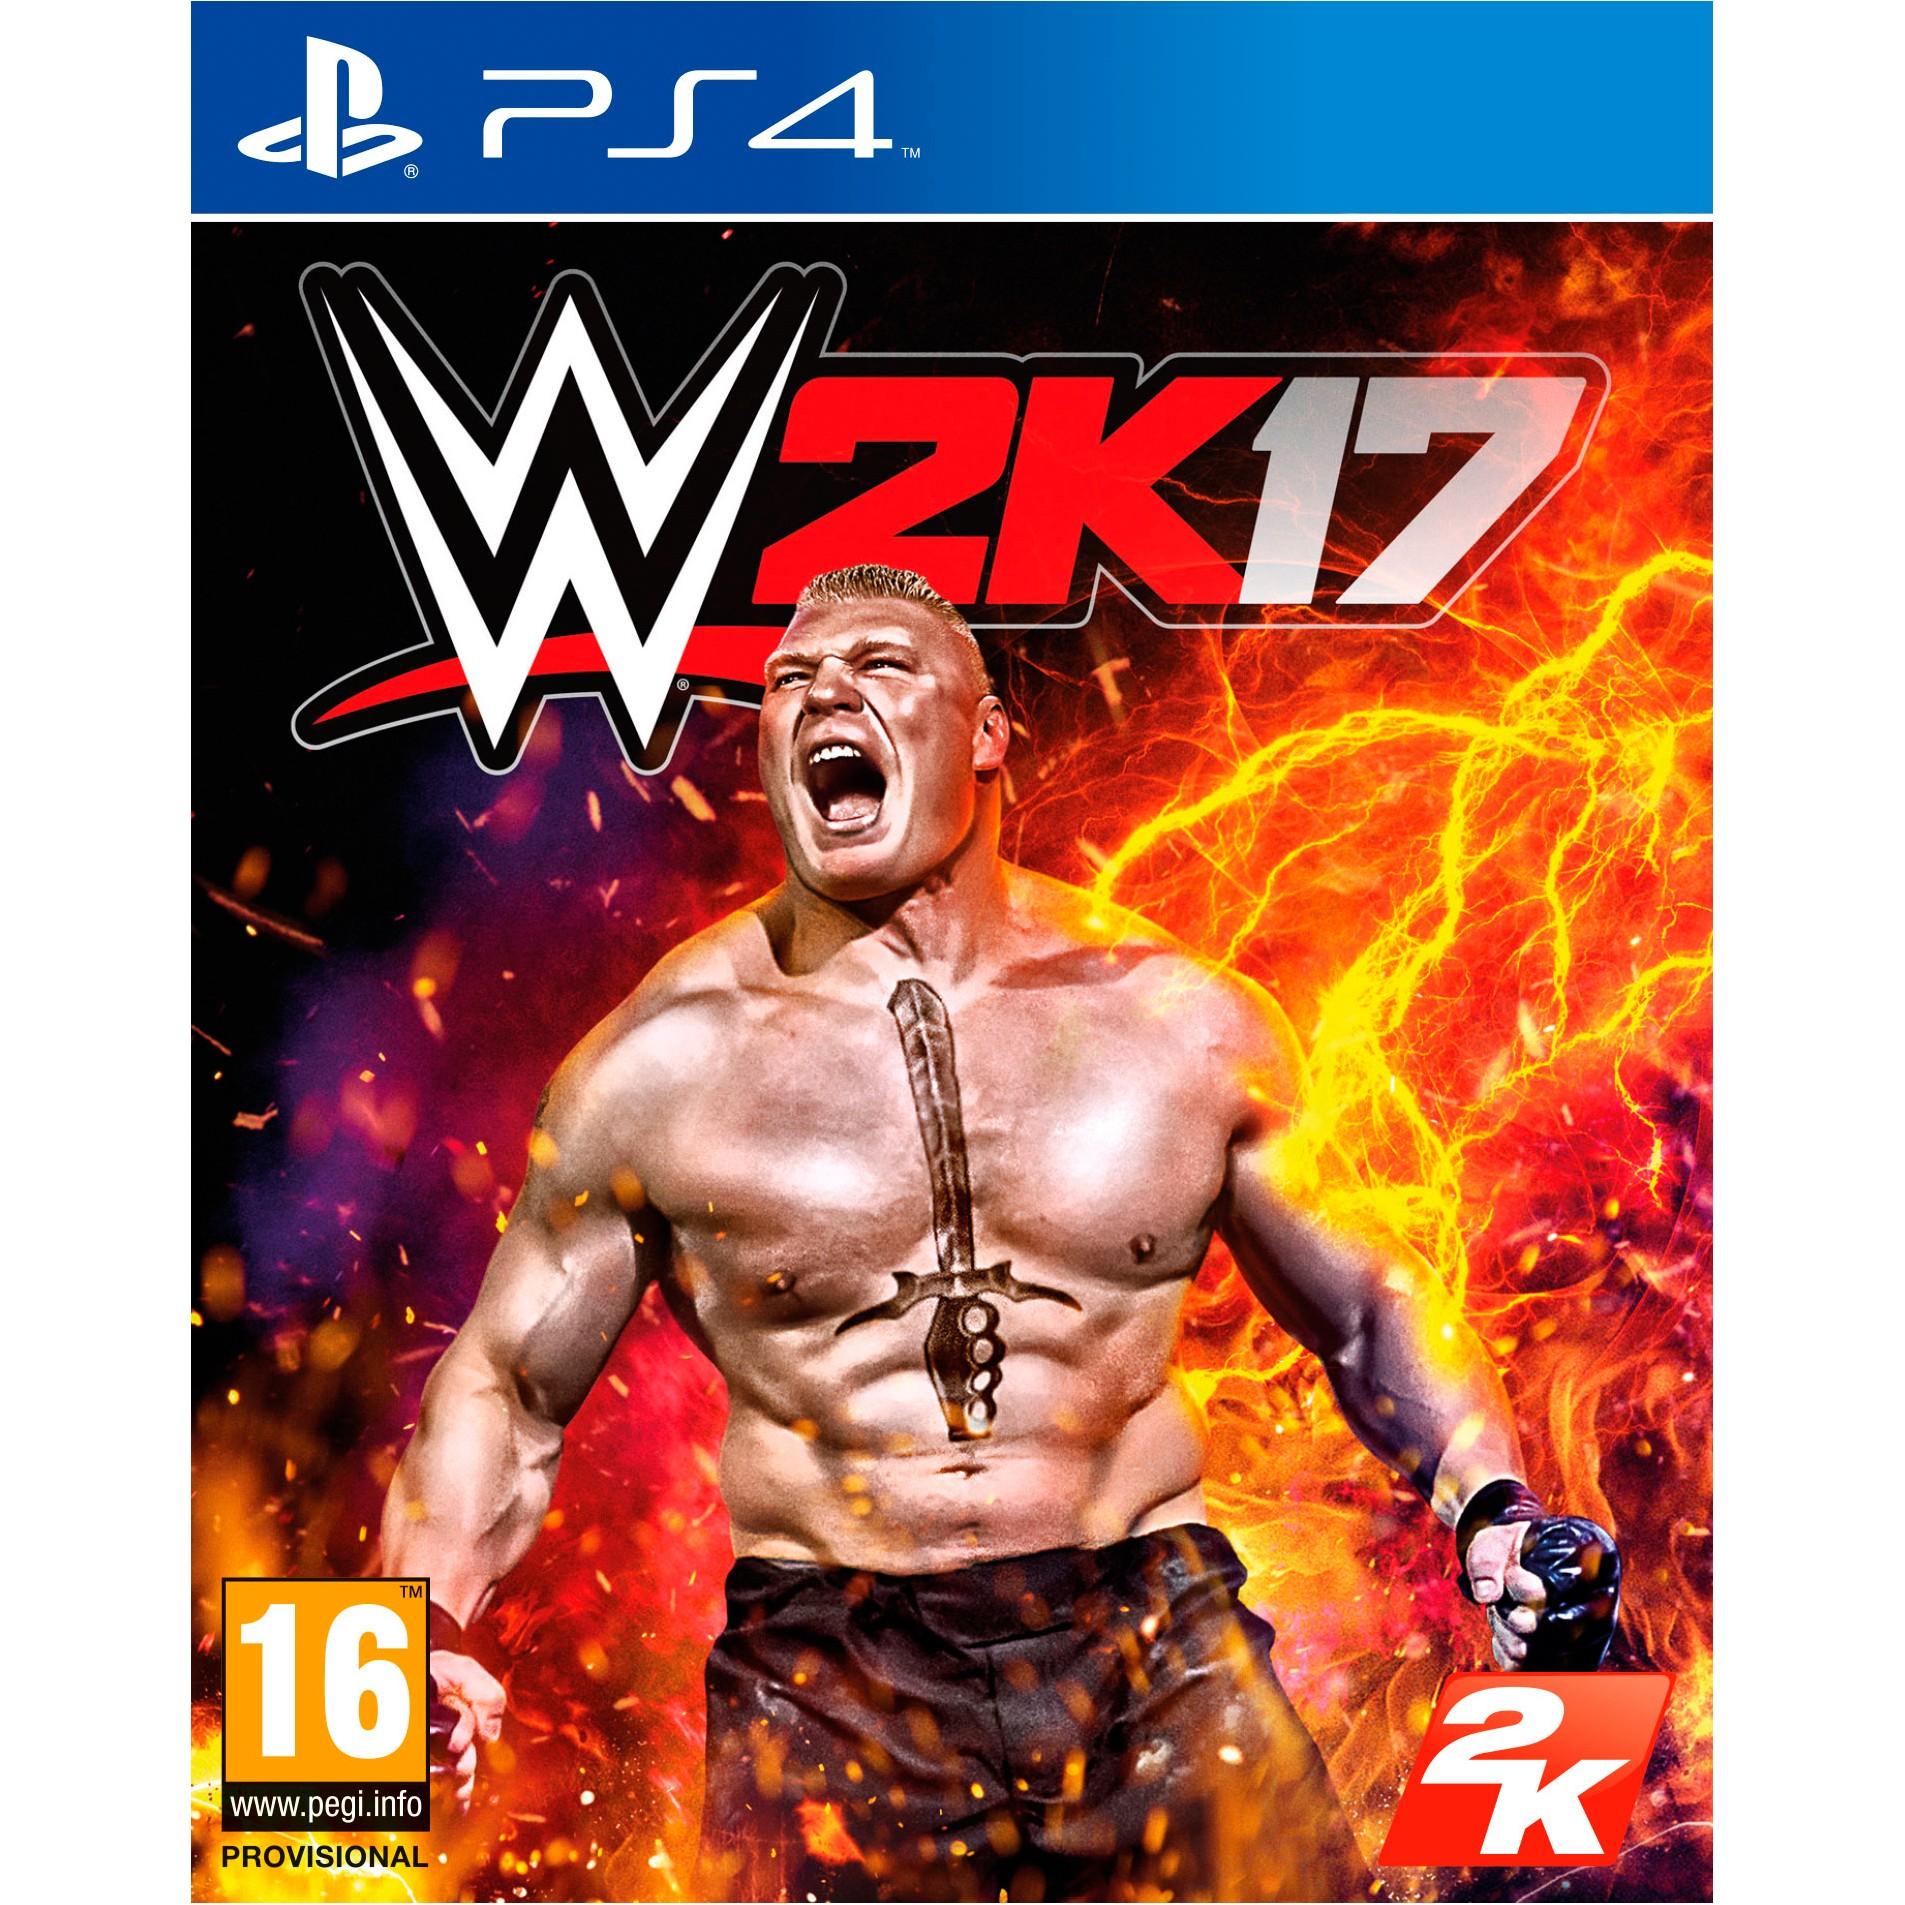 108043 : WWE 2K17 (PS4)